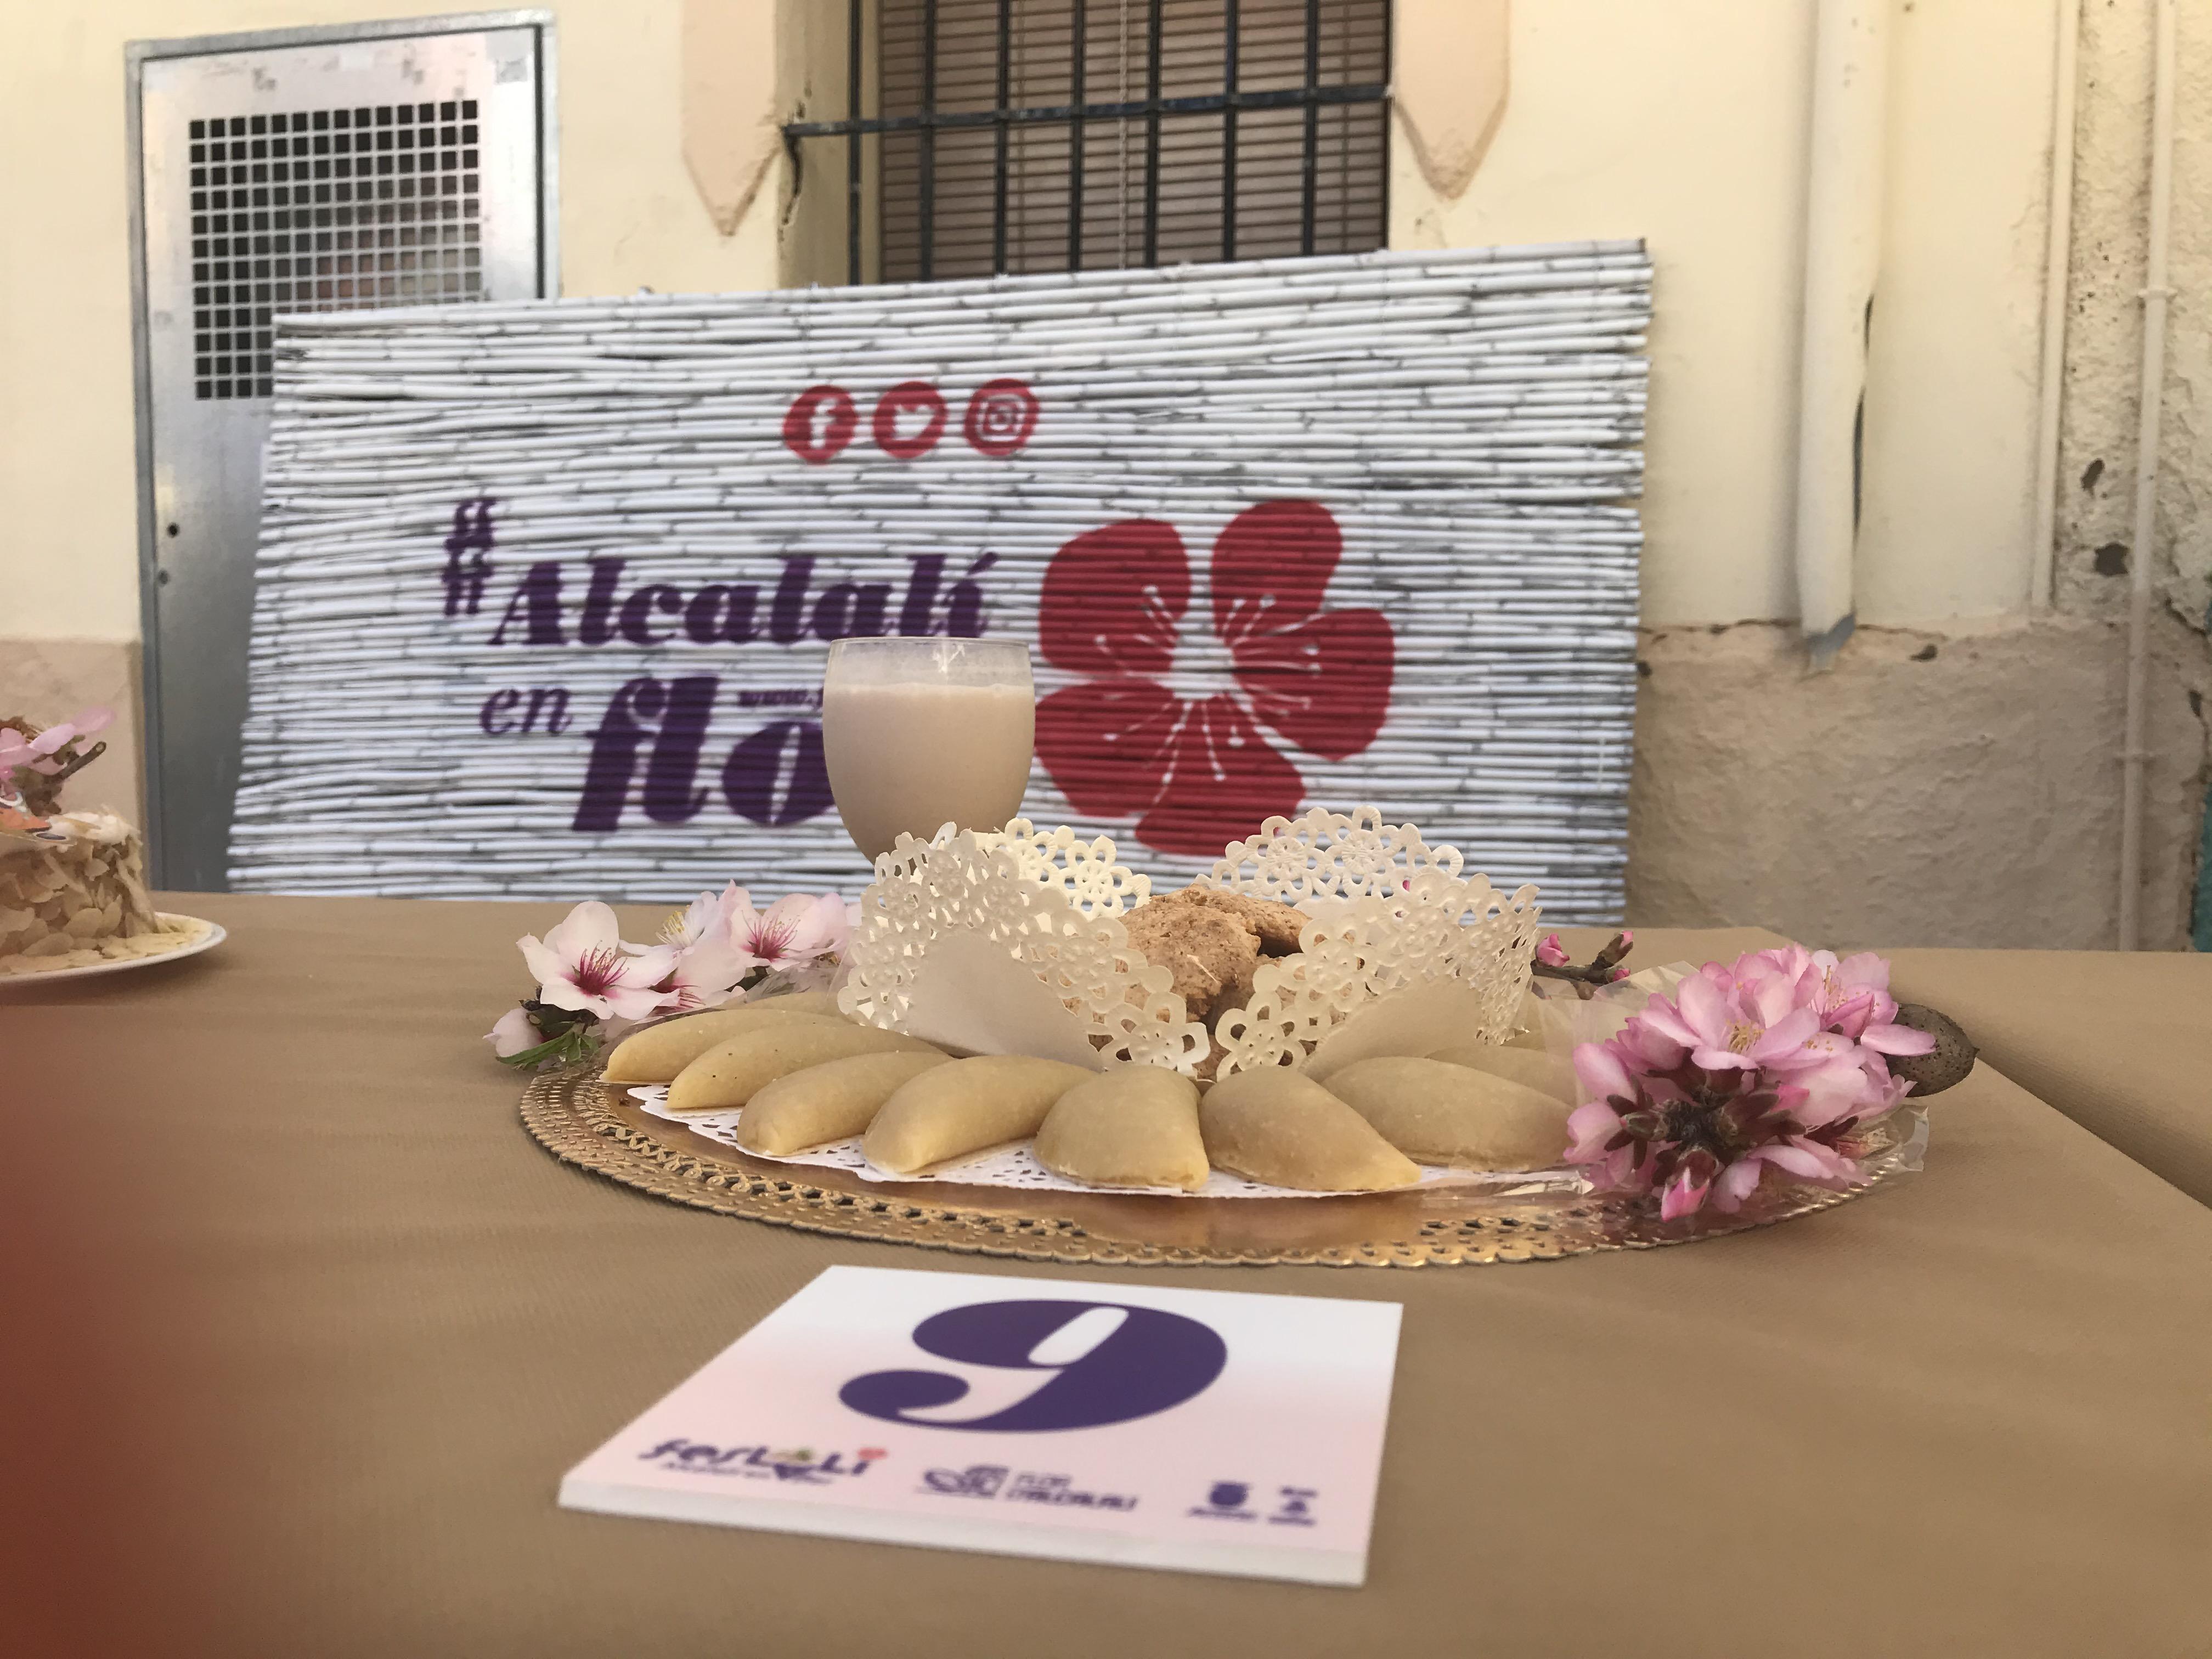 Concurso de pasteles con almendra de Alcalalí